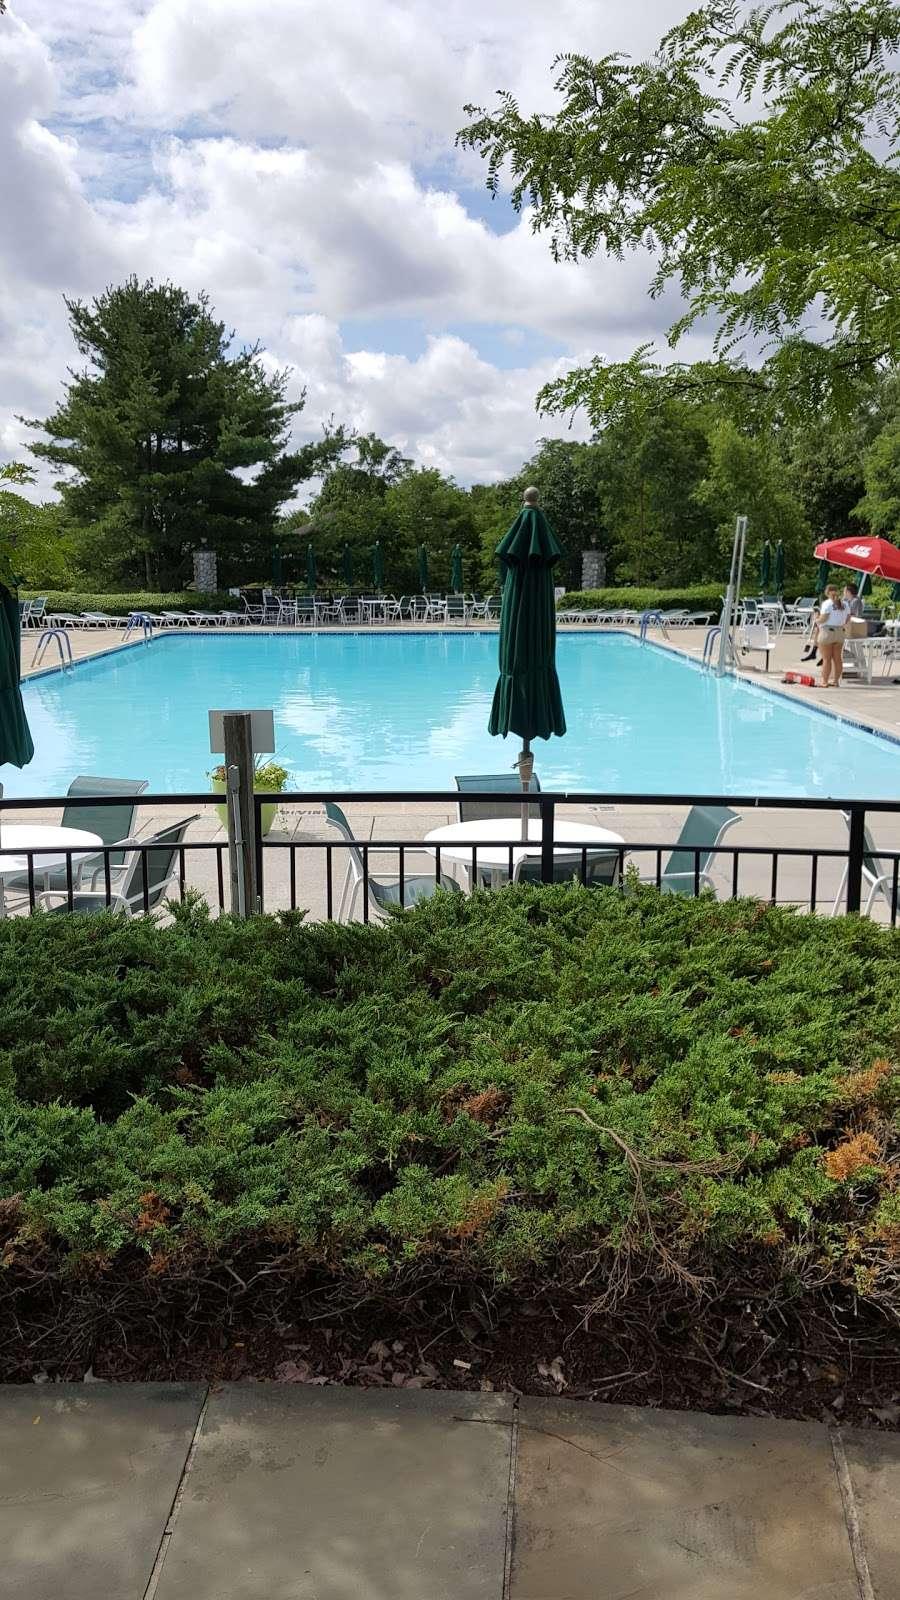 Four Seasons Spa Country Club 1560 Spring Meadow Dr Lakewood Nj 08701 Usa